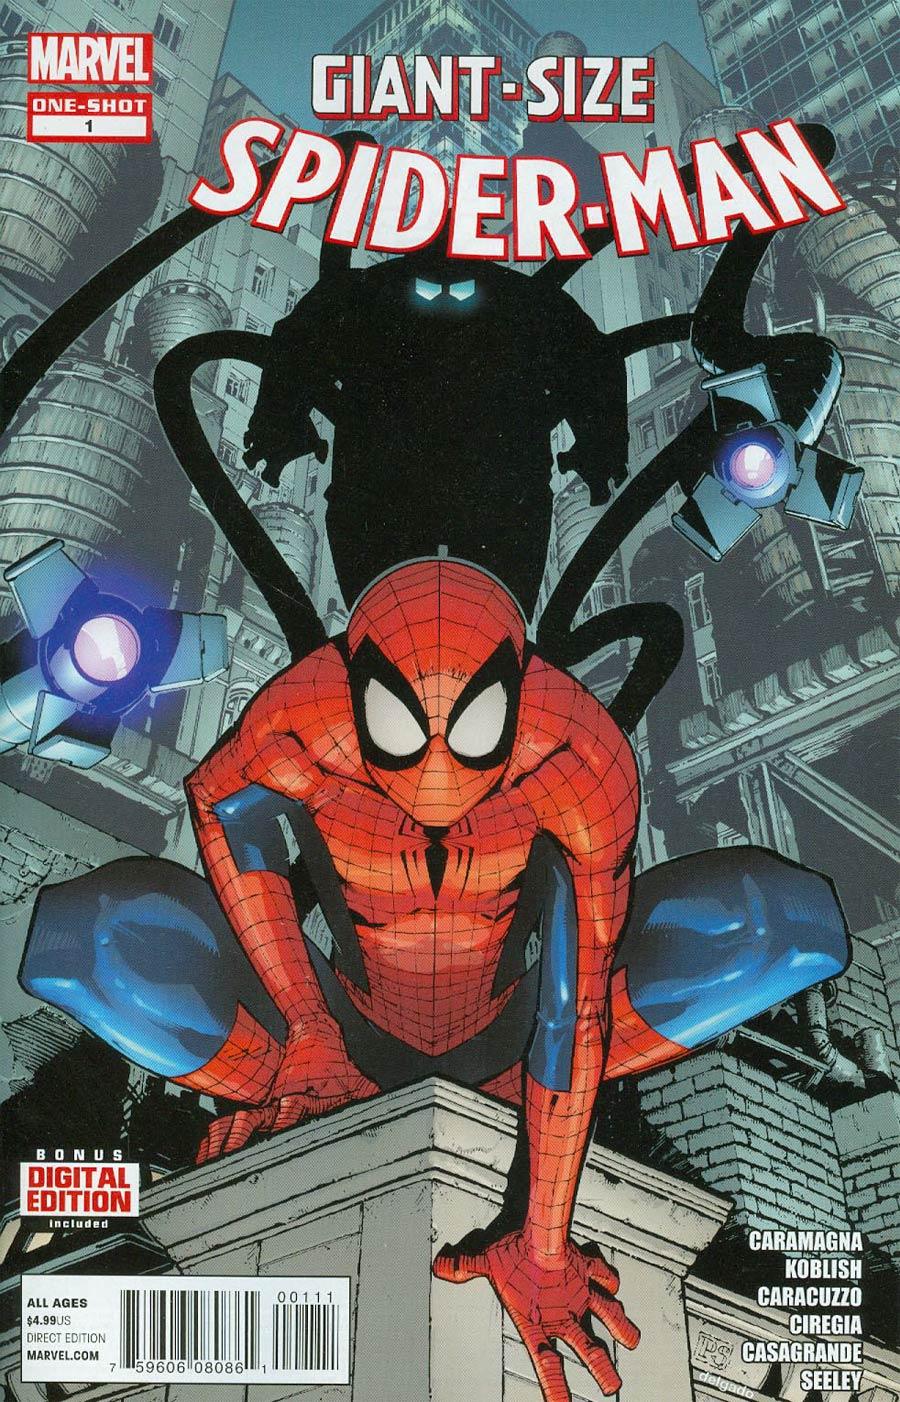 Giant Size Spider-Man Vol 2 #1